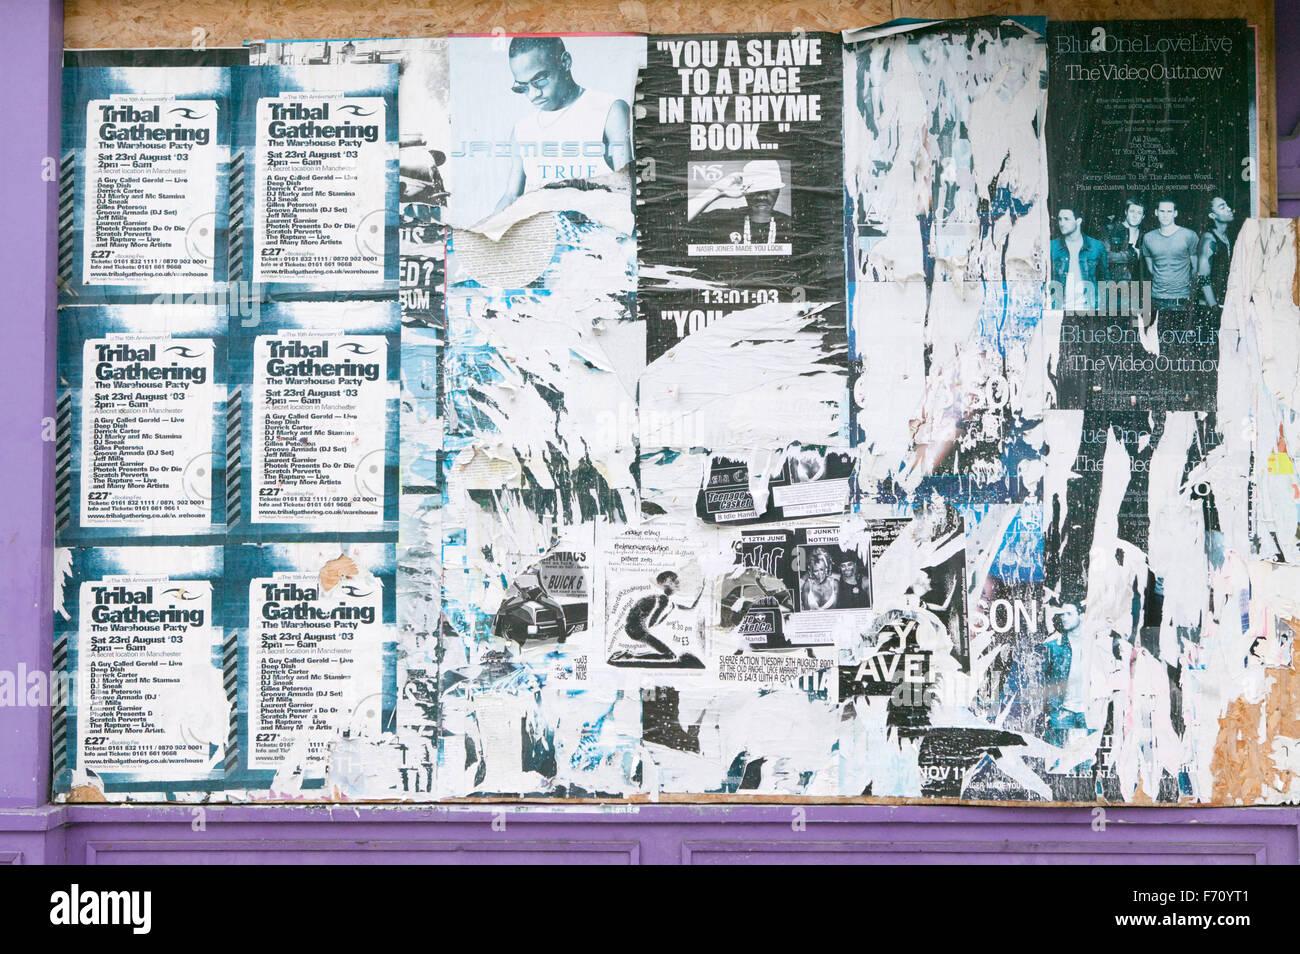 Old posters peeling off billboard, - Stock Image